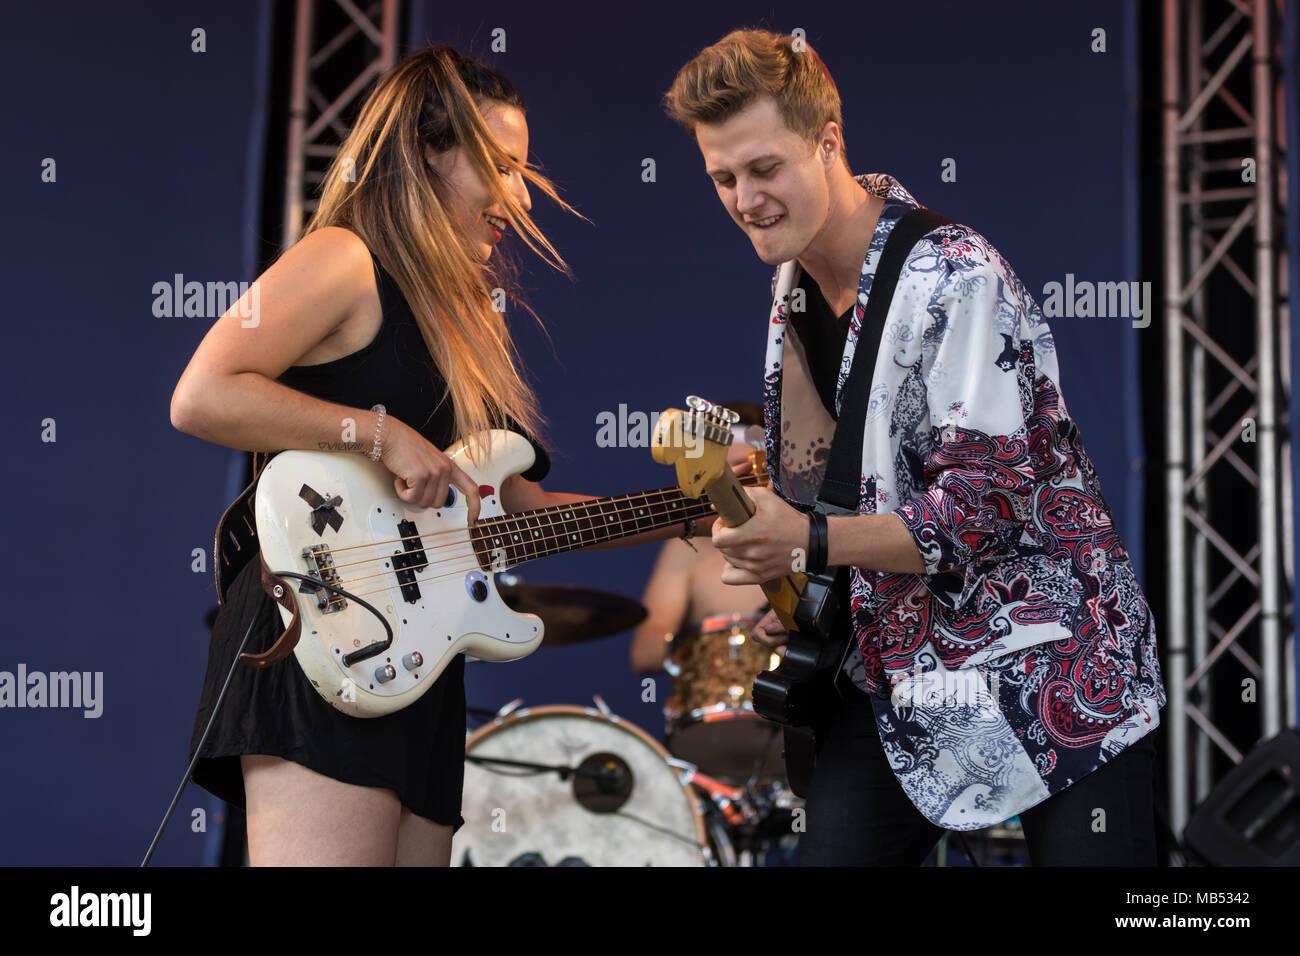 The Swiss band Mama Jefferson with singer Vanja Vukelic, guitarist Silvan Gerhard and drummer Mattia Ferrari, live at the 25th - Stock Image